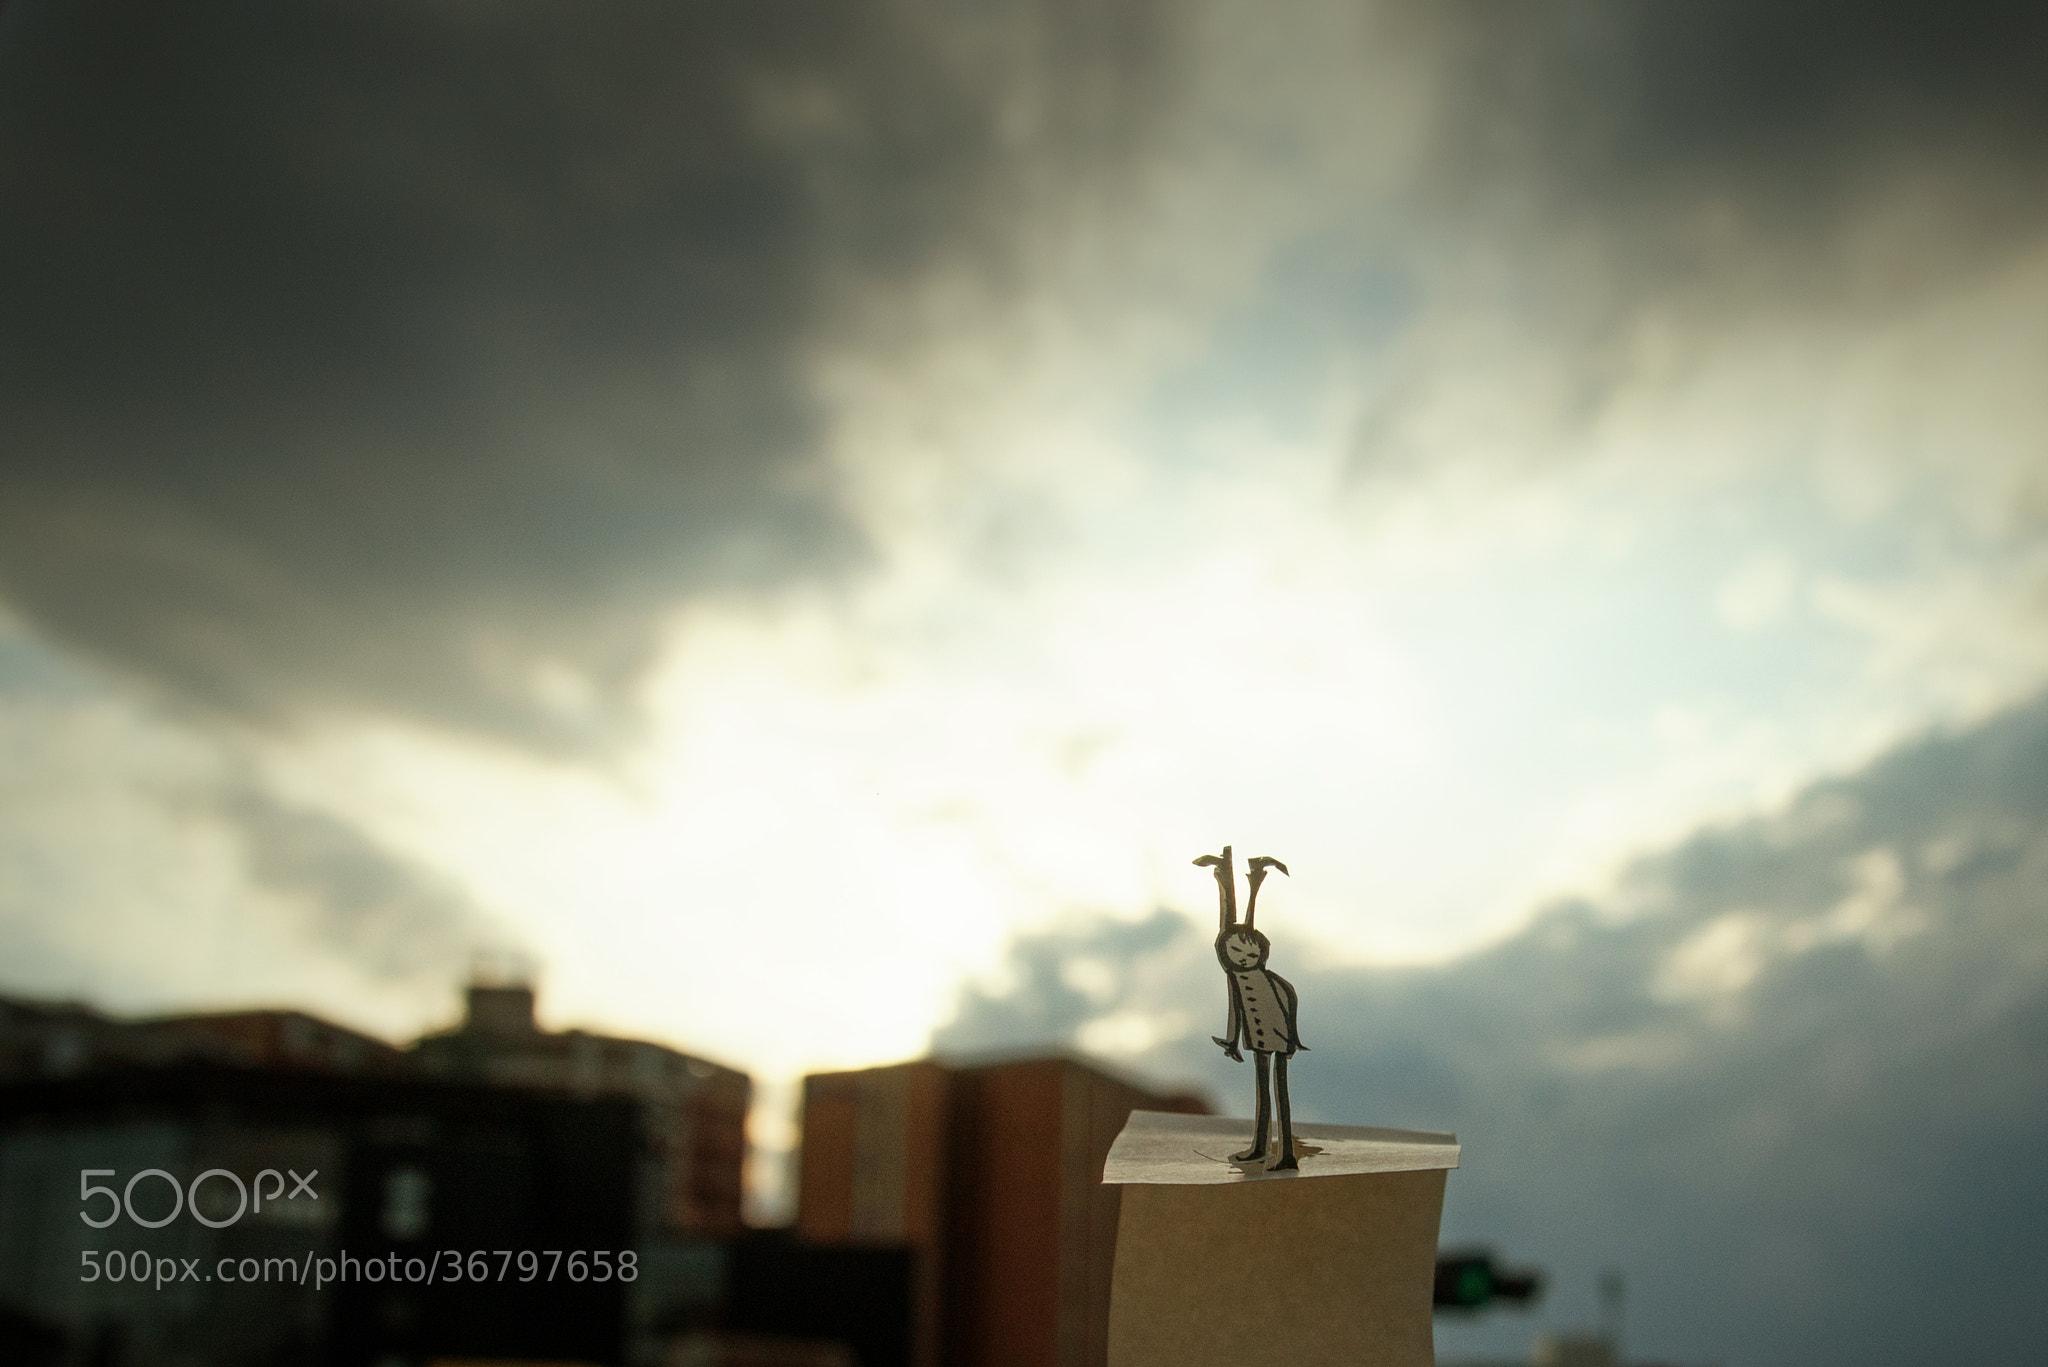 Photograph Untitled by Kouichi Chiba on 500px